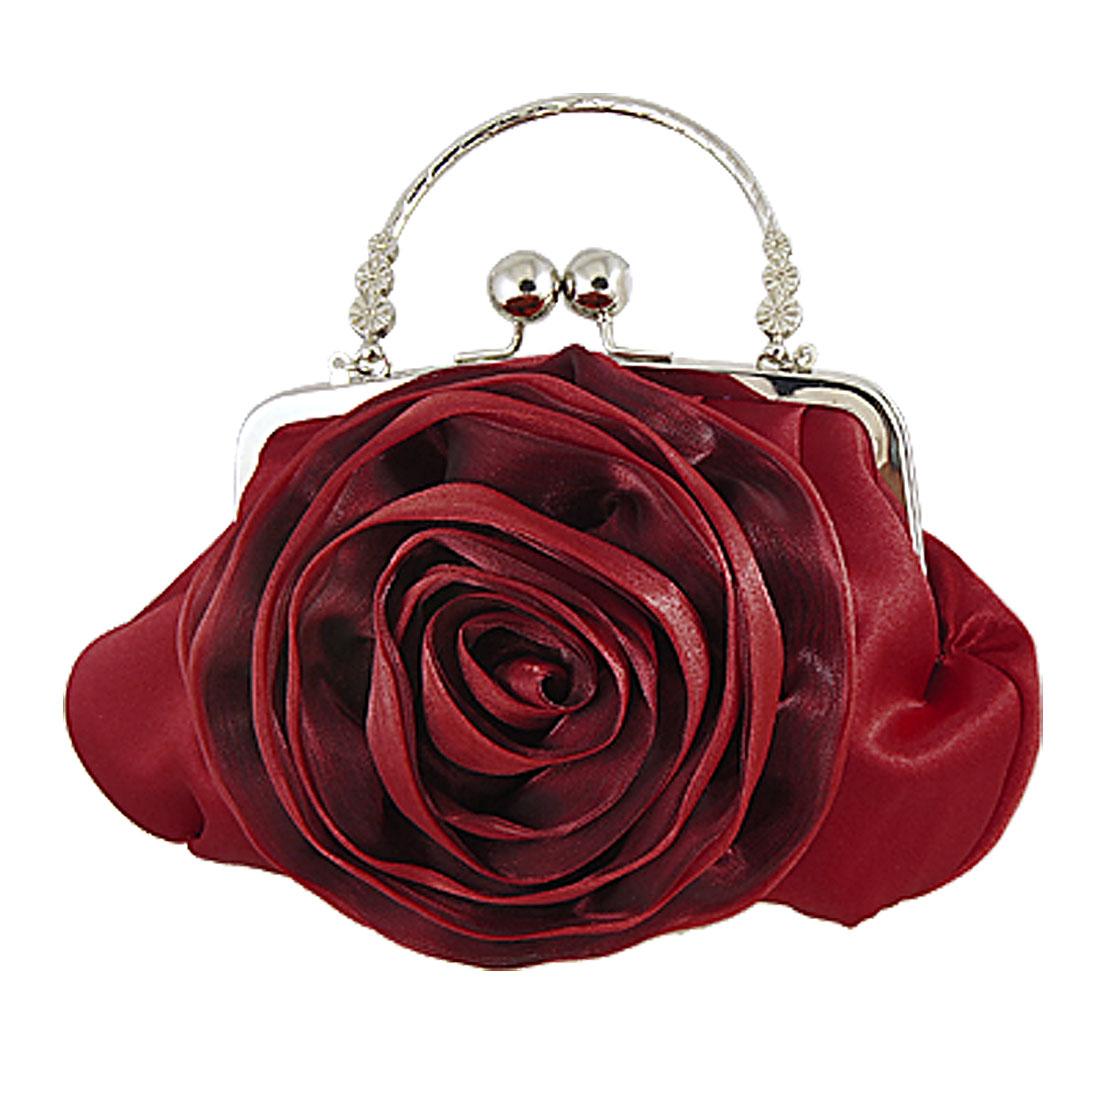 Women Kiss Lock Closure Flower Accent Bridal Handbag Red